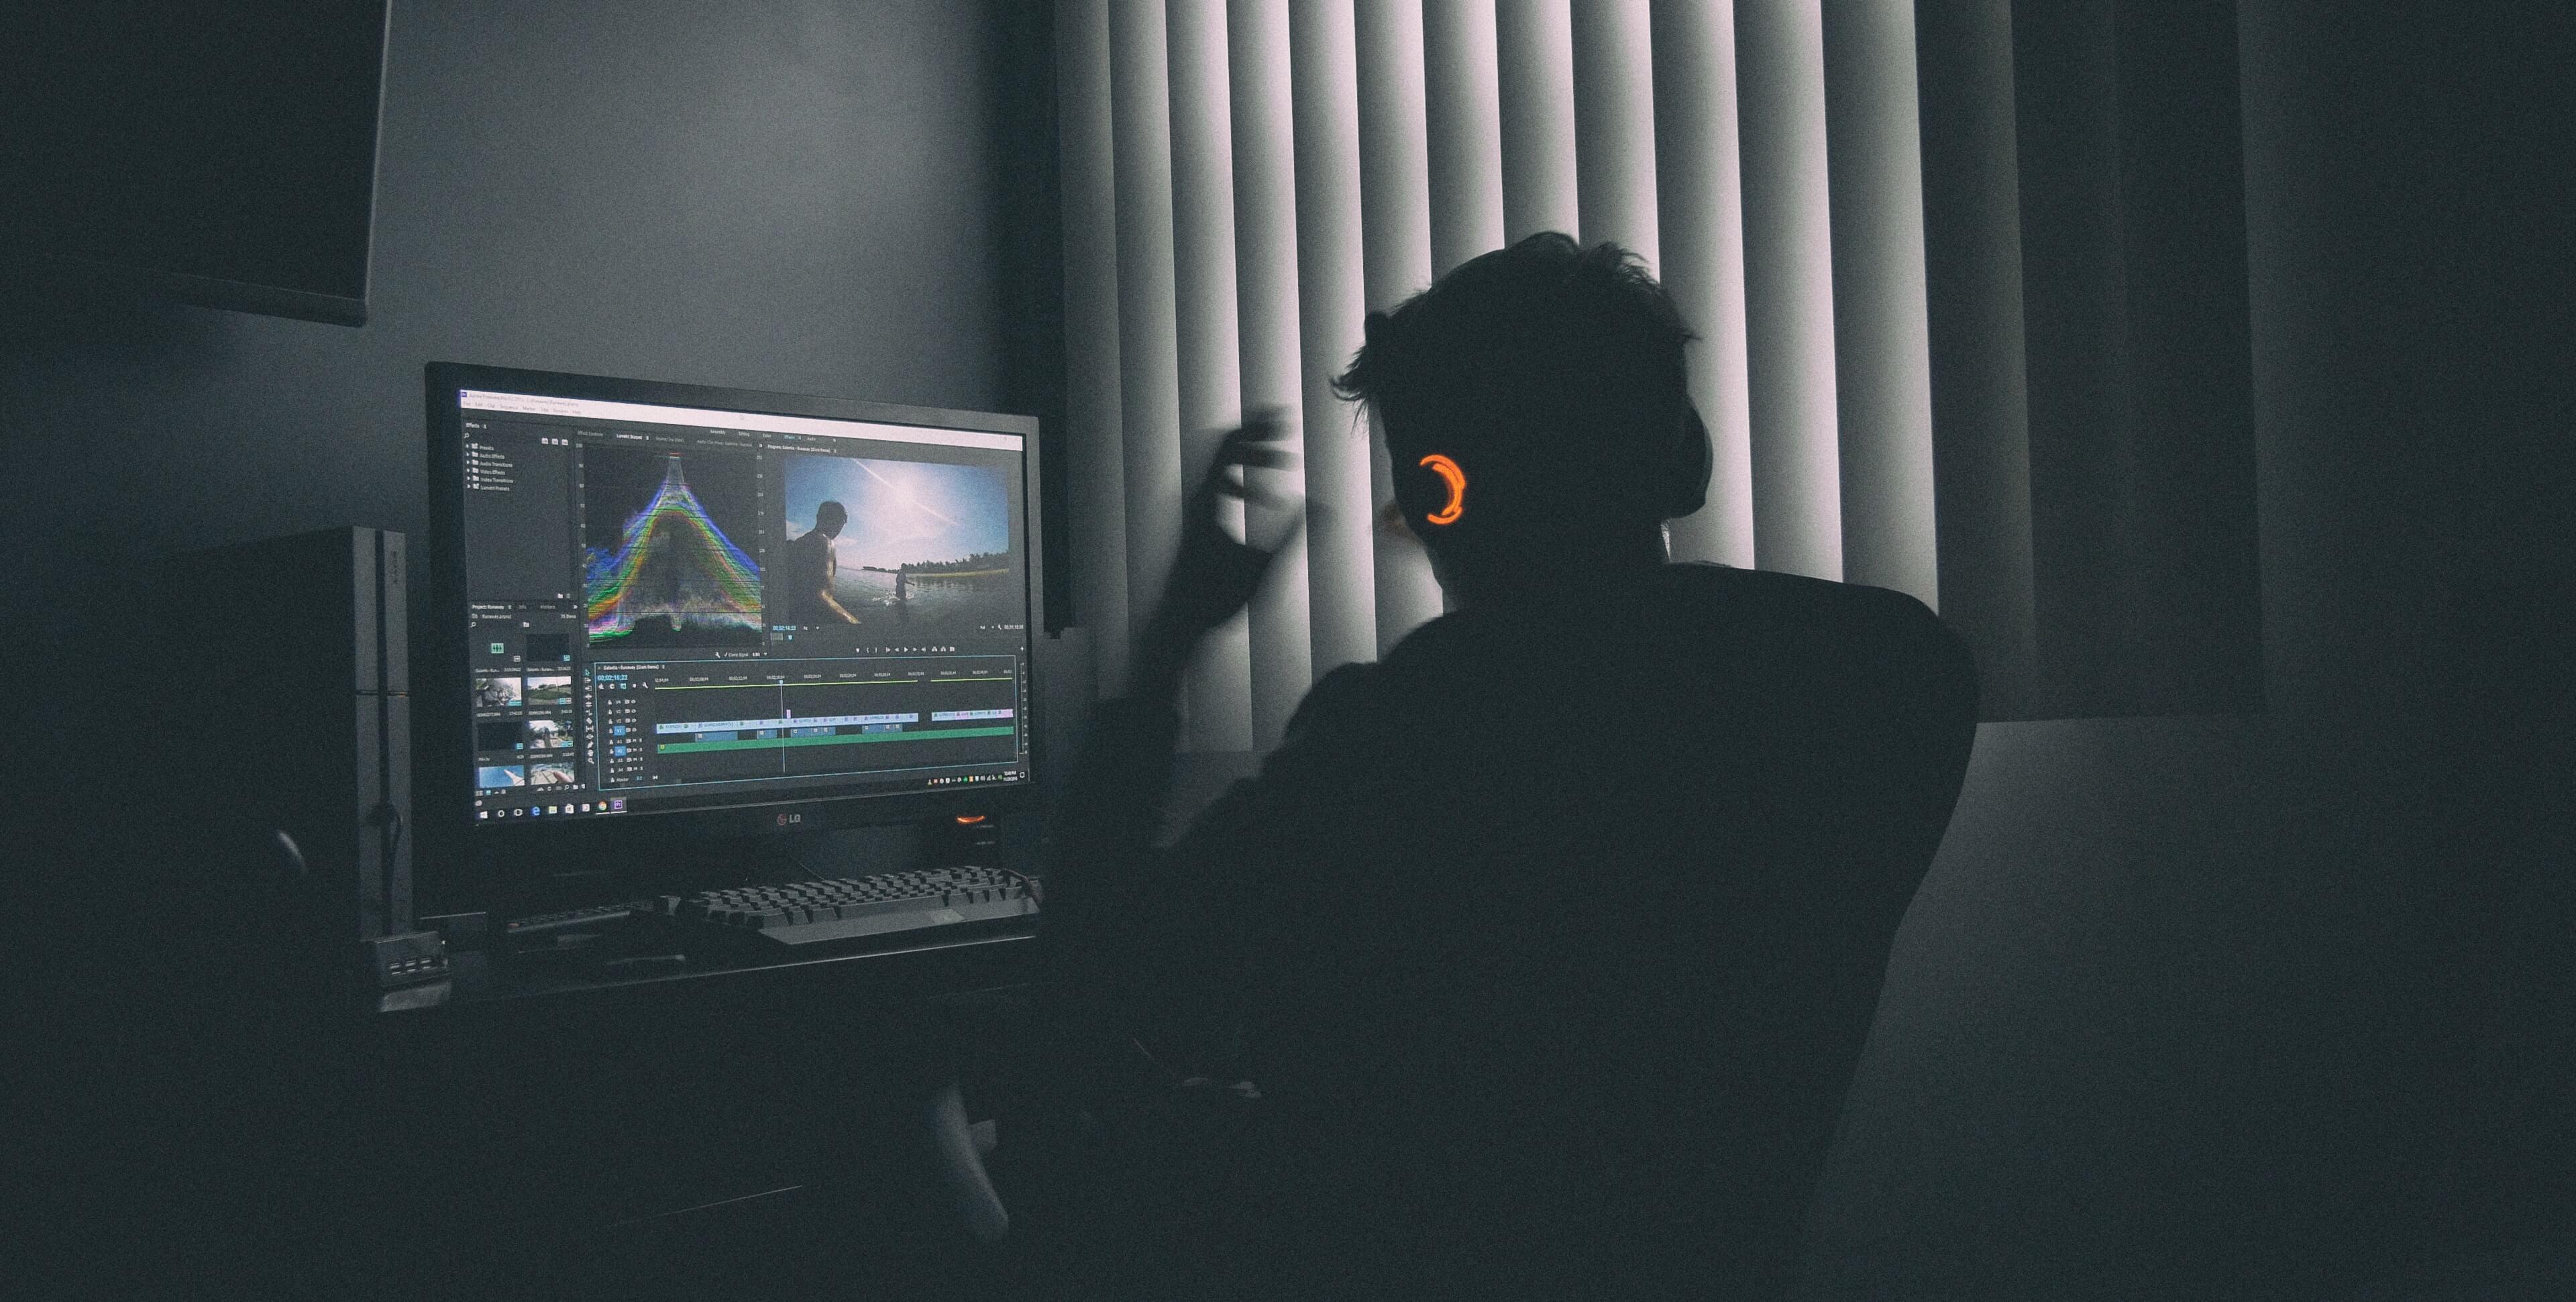 Adobe Premiere Proを無料で使う方法は?体験版を使い続けることはできる?